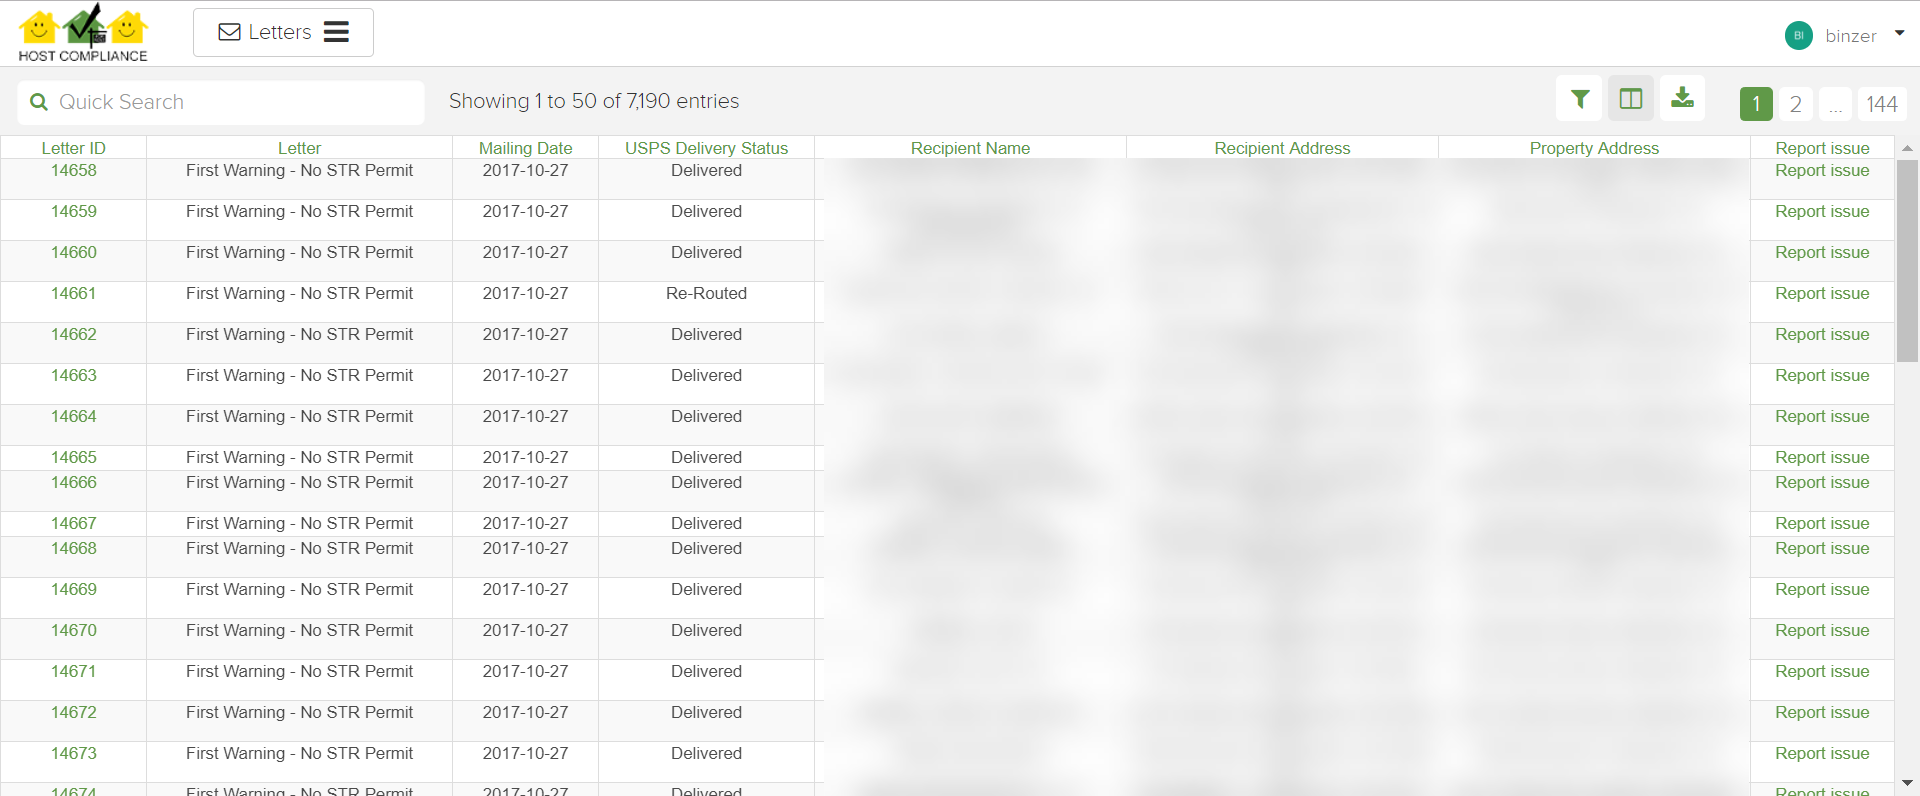 Letter management dashboard screenshot example.png